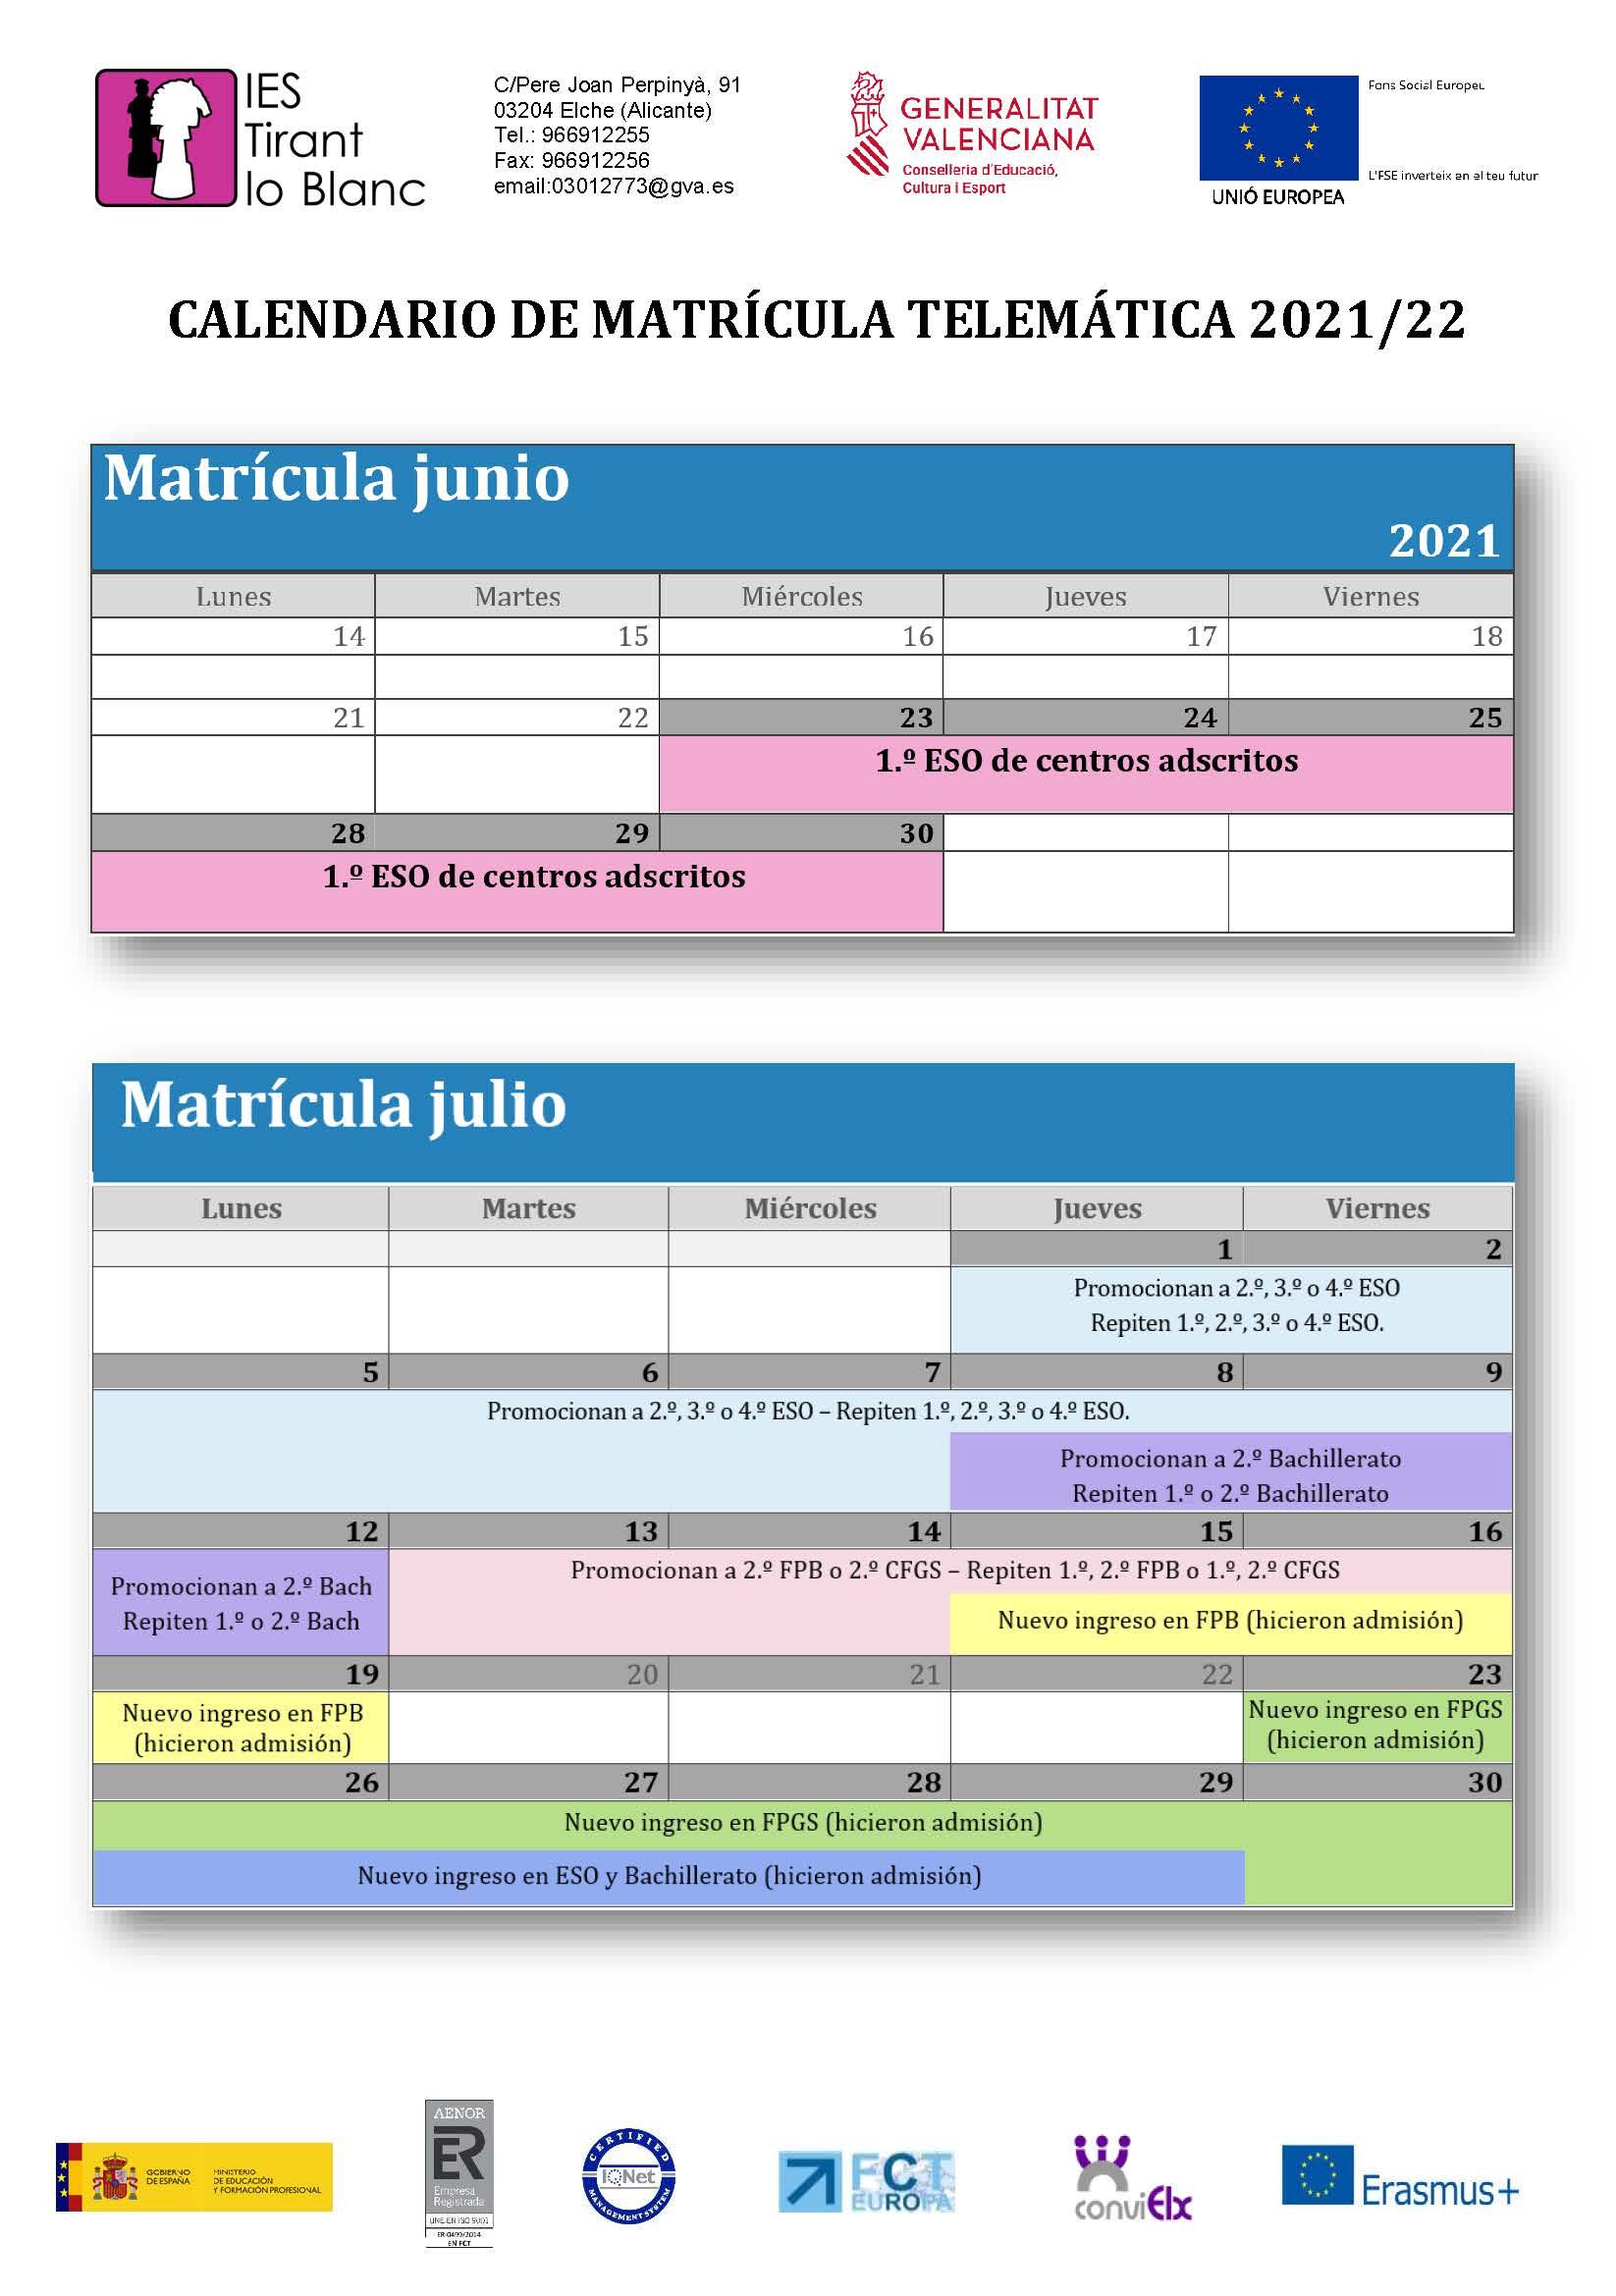 CALENDARIOS MATRICULA TELEMATICA 2021-22